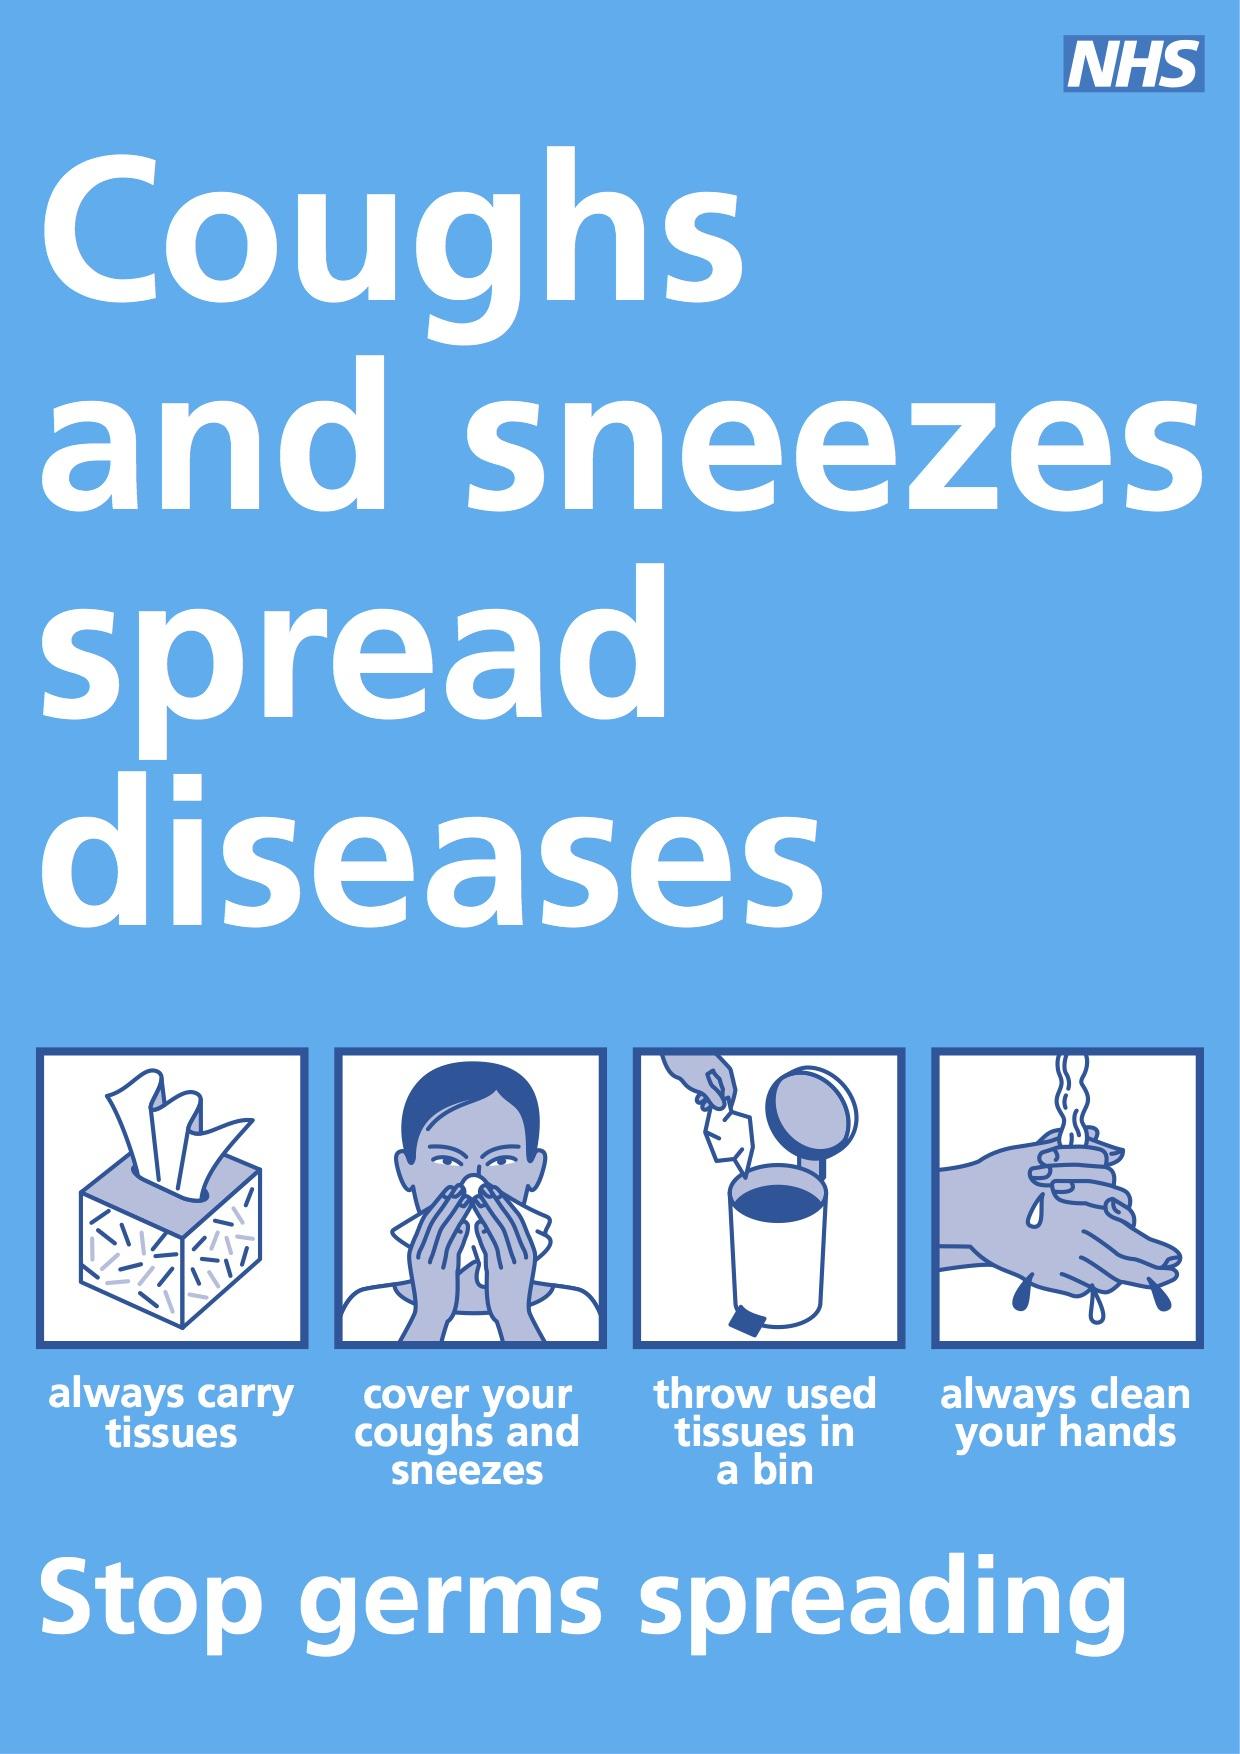 Free Infection Control / Handwashing Poster Downloads - Free Printable Hand Washing Posters